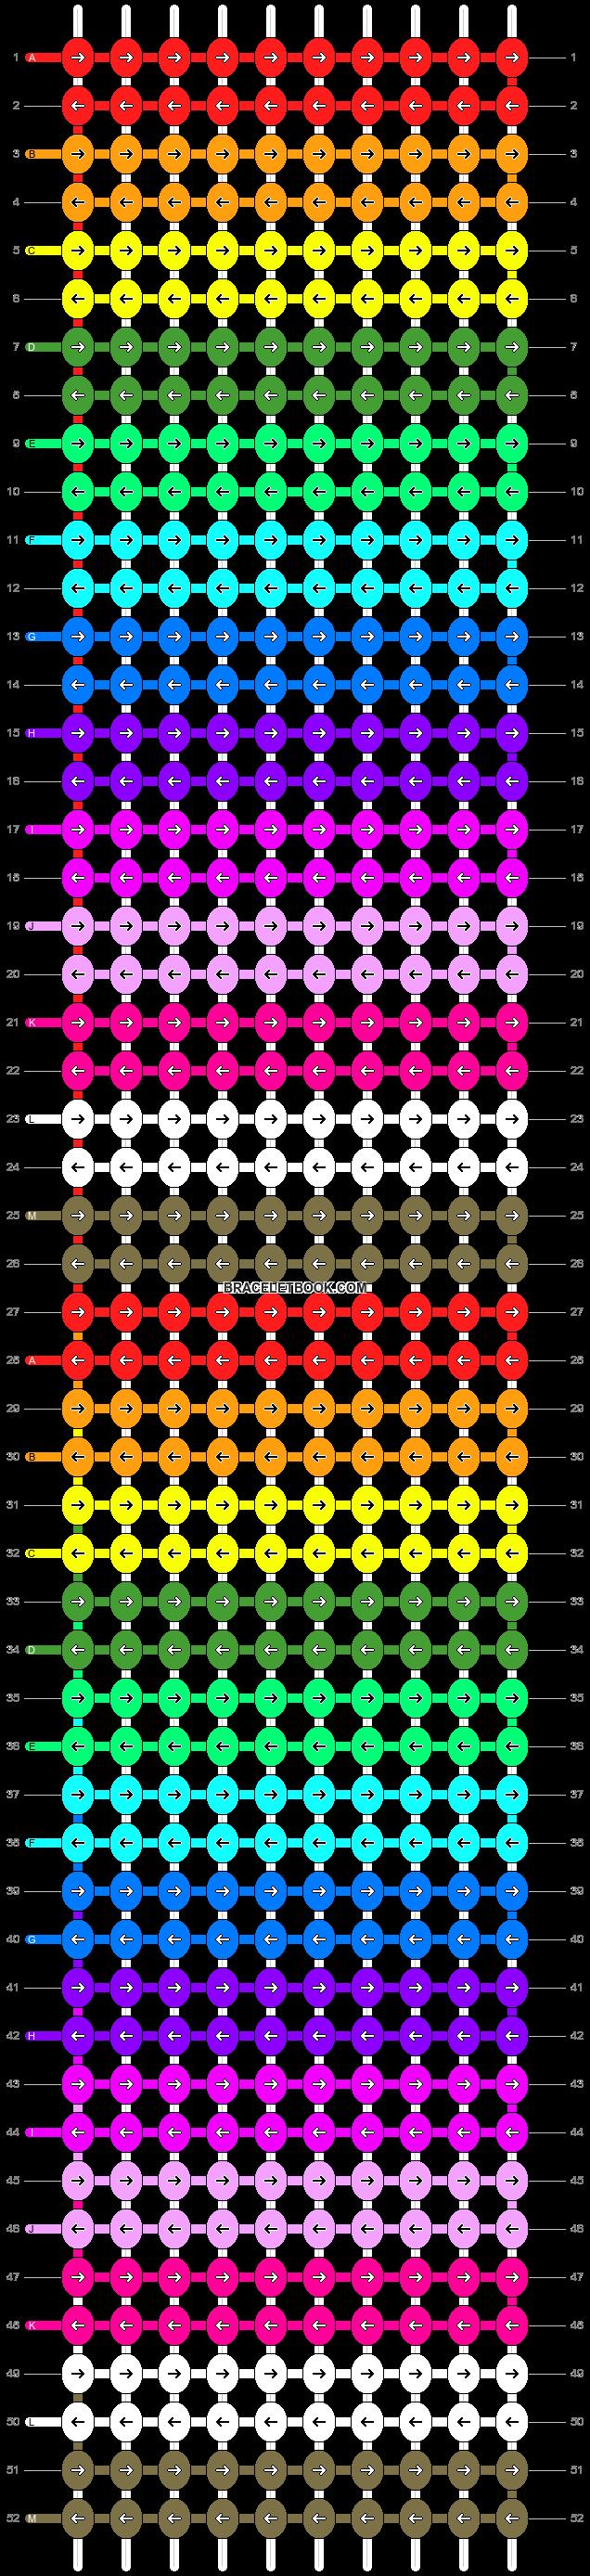 Alpha pattern #26255 pattern